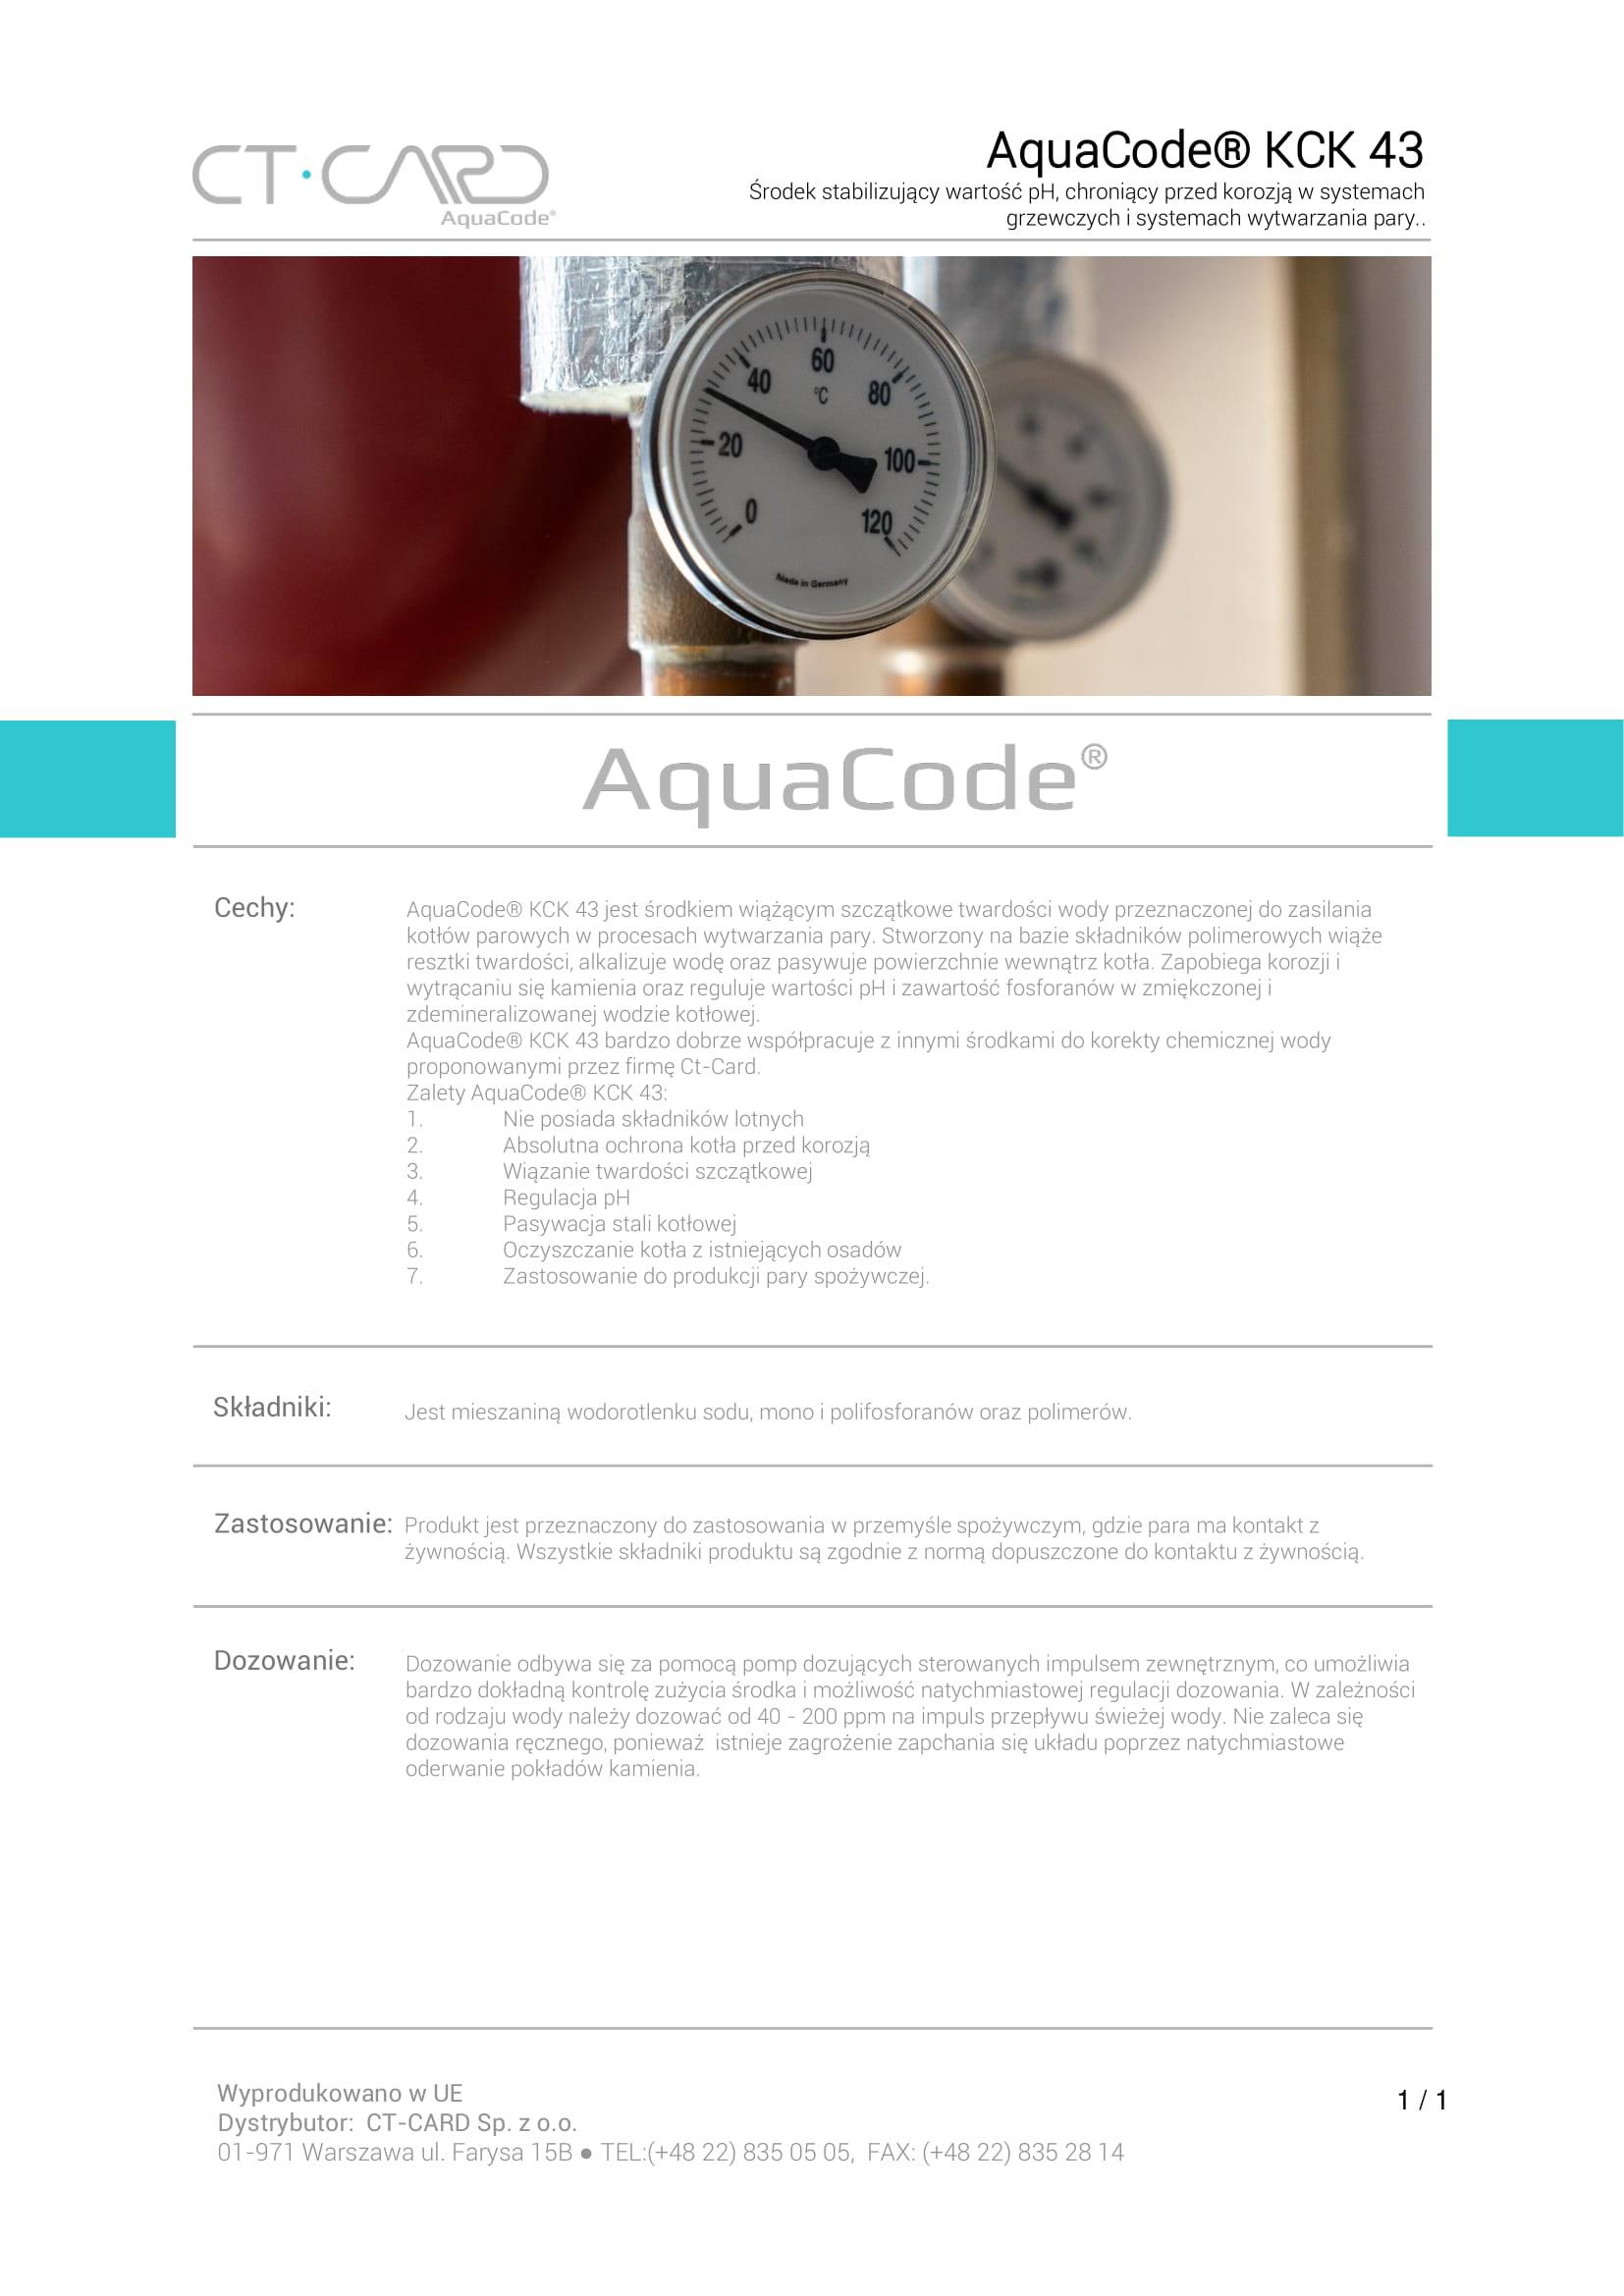 AquaCode_KCK_43-1